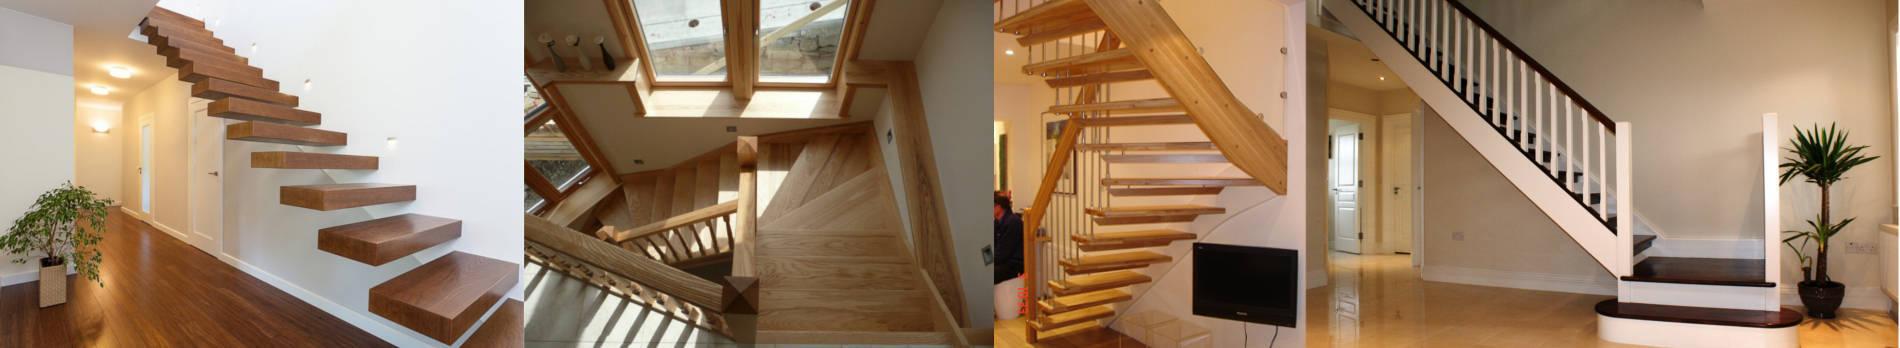 laiptai kainos